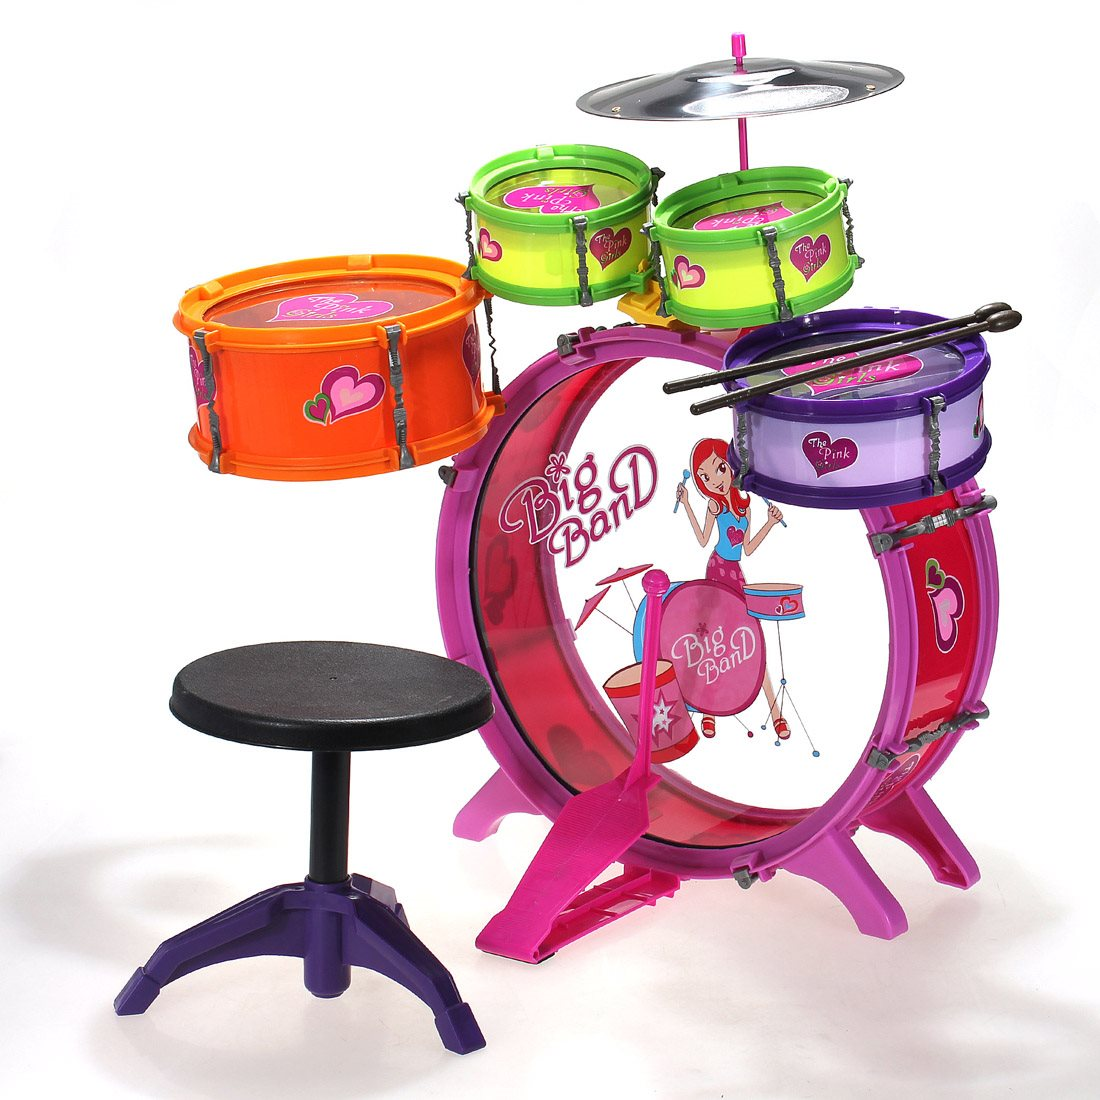 Corner Toddler Drum Set Walmart Canada Toddler Drum Set Australia